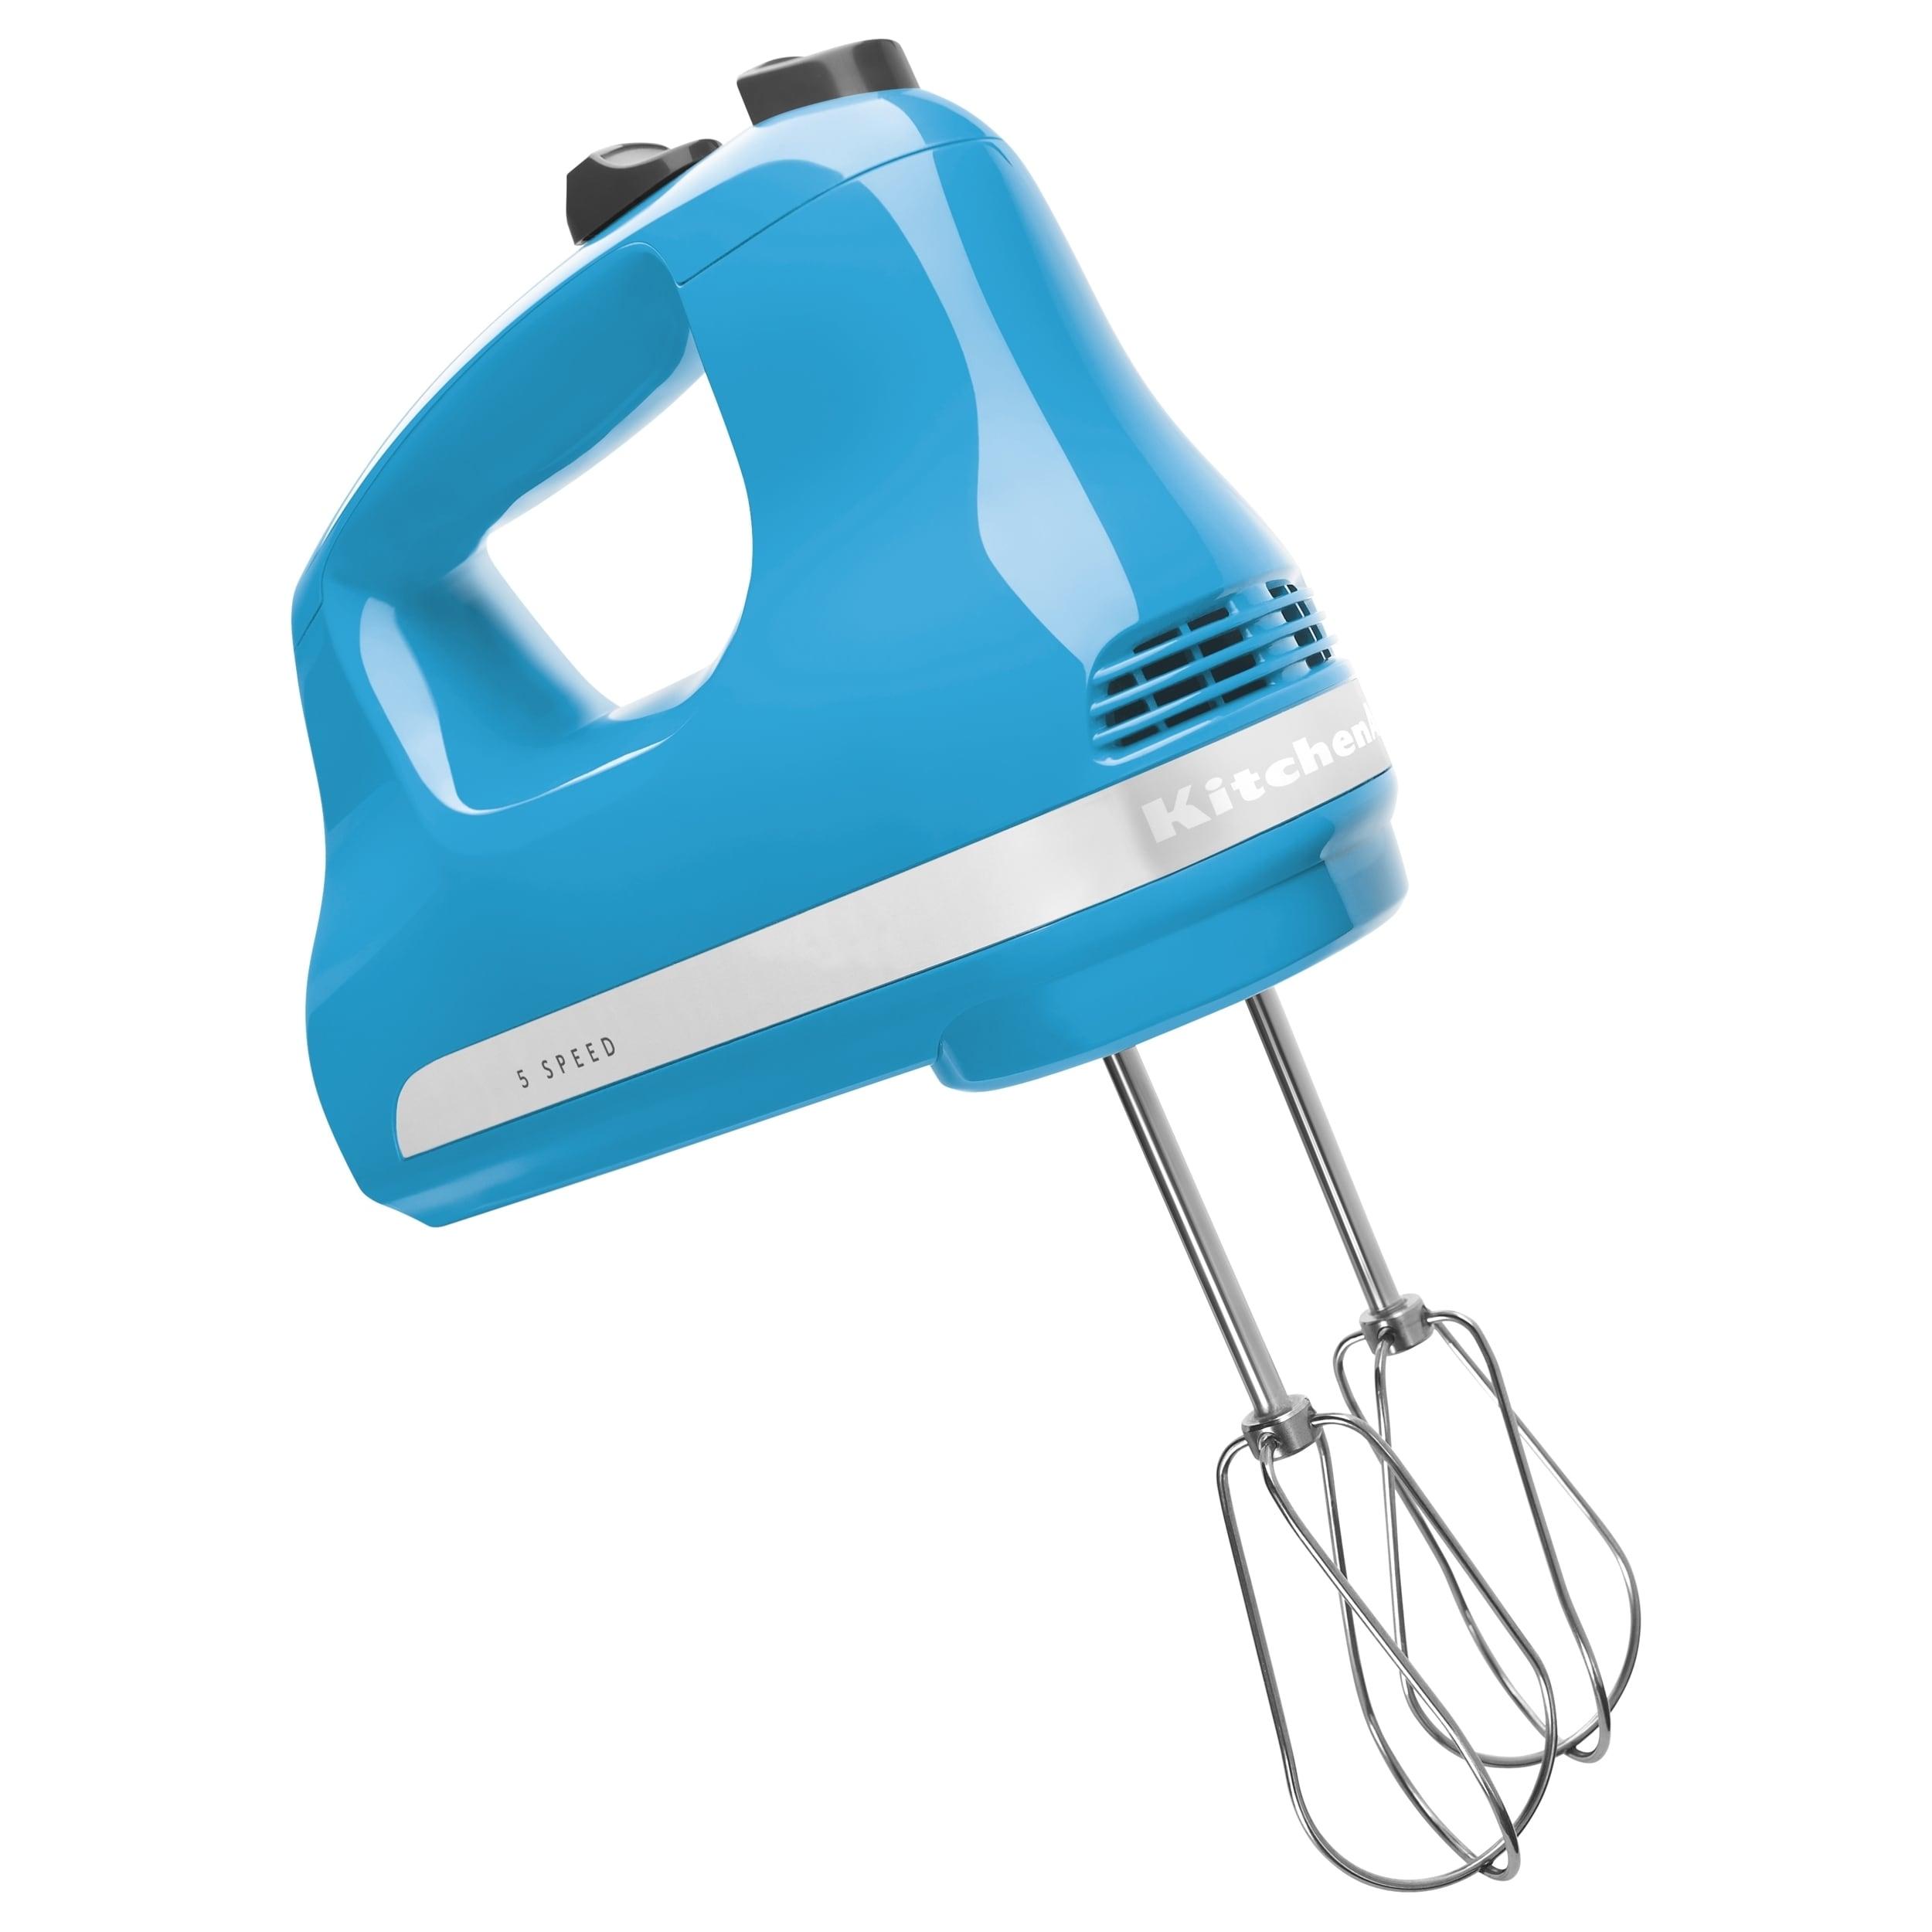 KitchenAid Ultra Power KHM512CL Hand Mixer, Blue (Crystal)